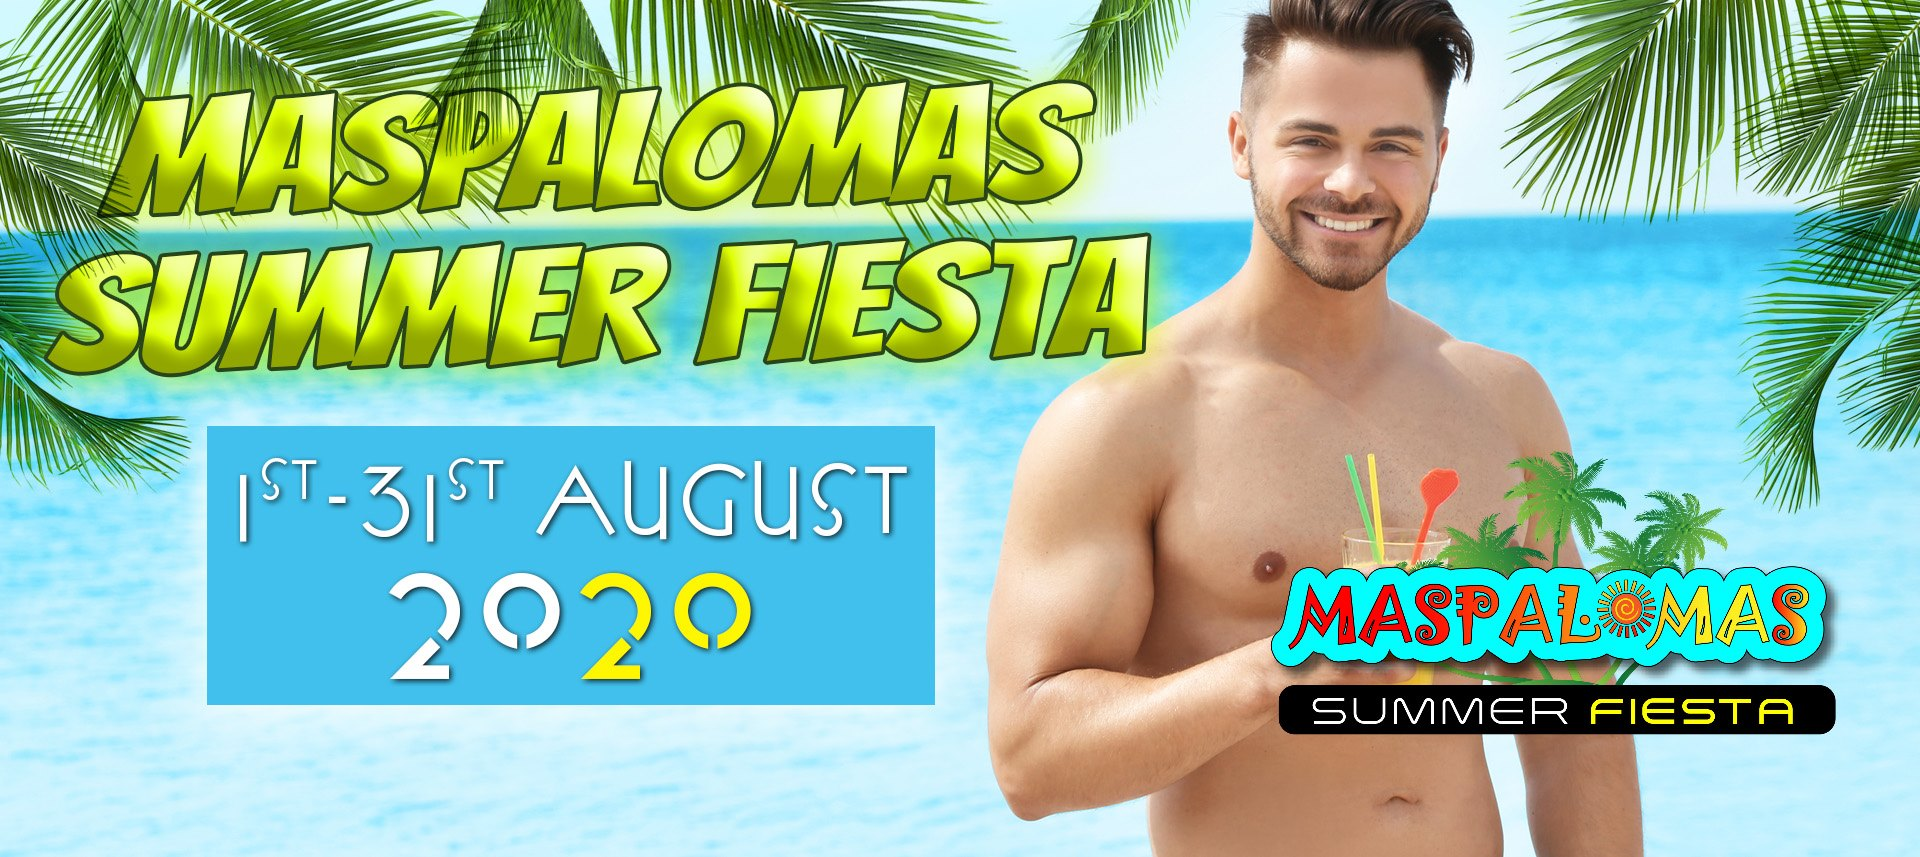 Maspalomas Summer Fiesta